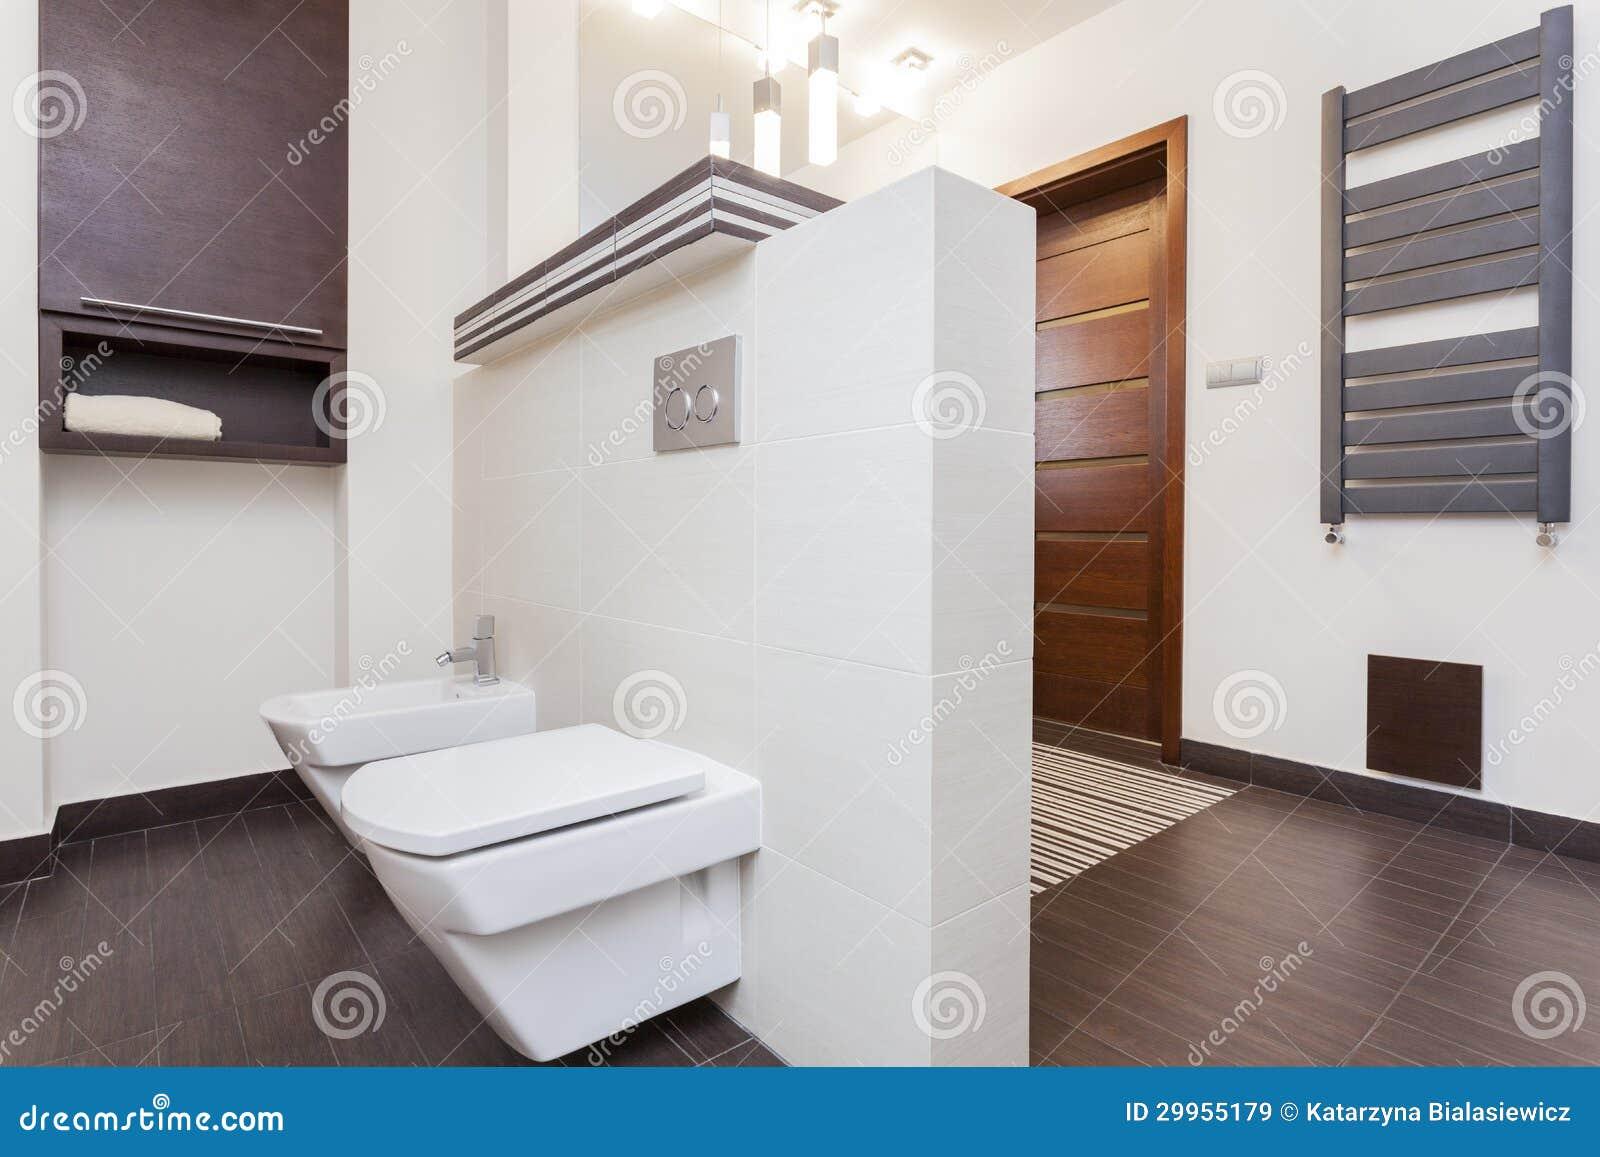 Groot ontwerp kleine badkamers royalty vrije stock afbeeldingen afbeelding 29955179 - Ontwerp badkamer model ...